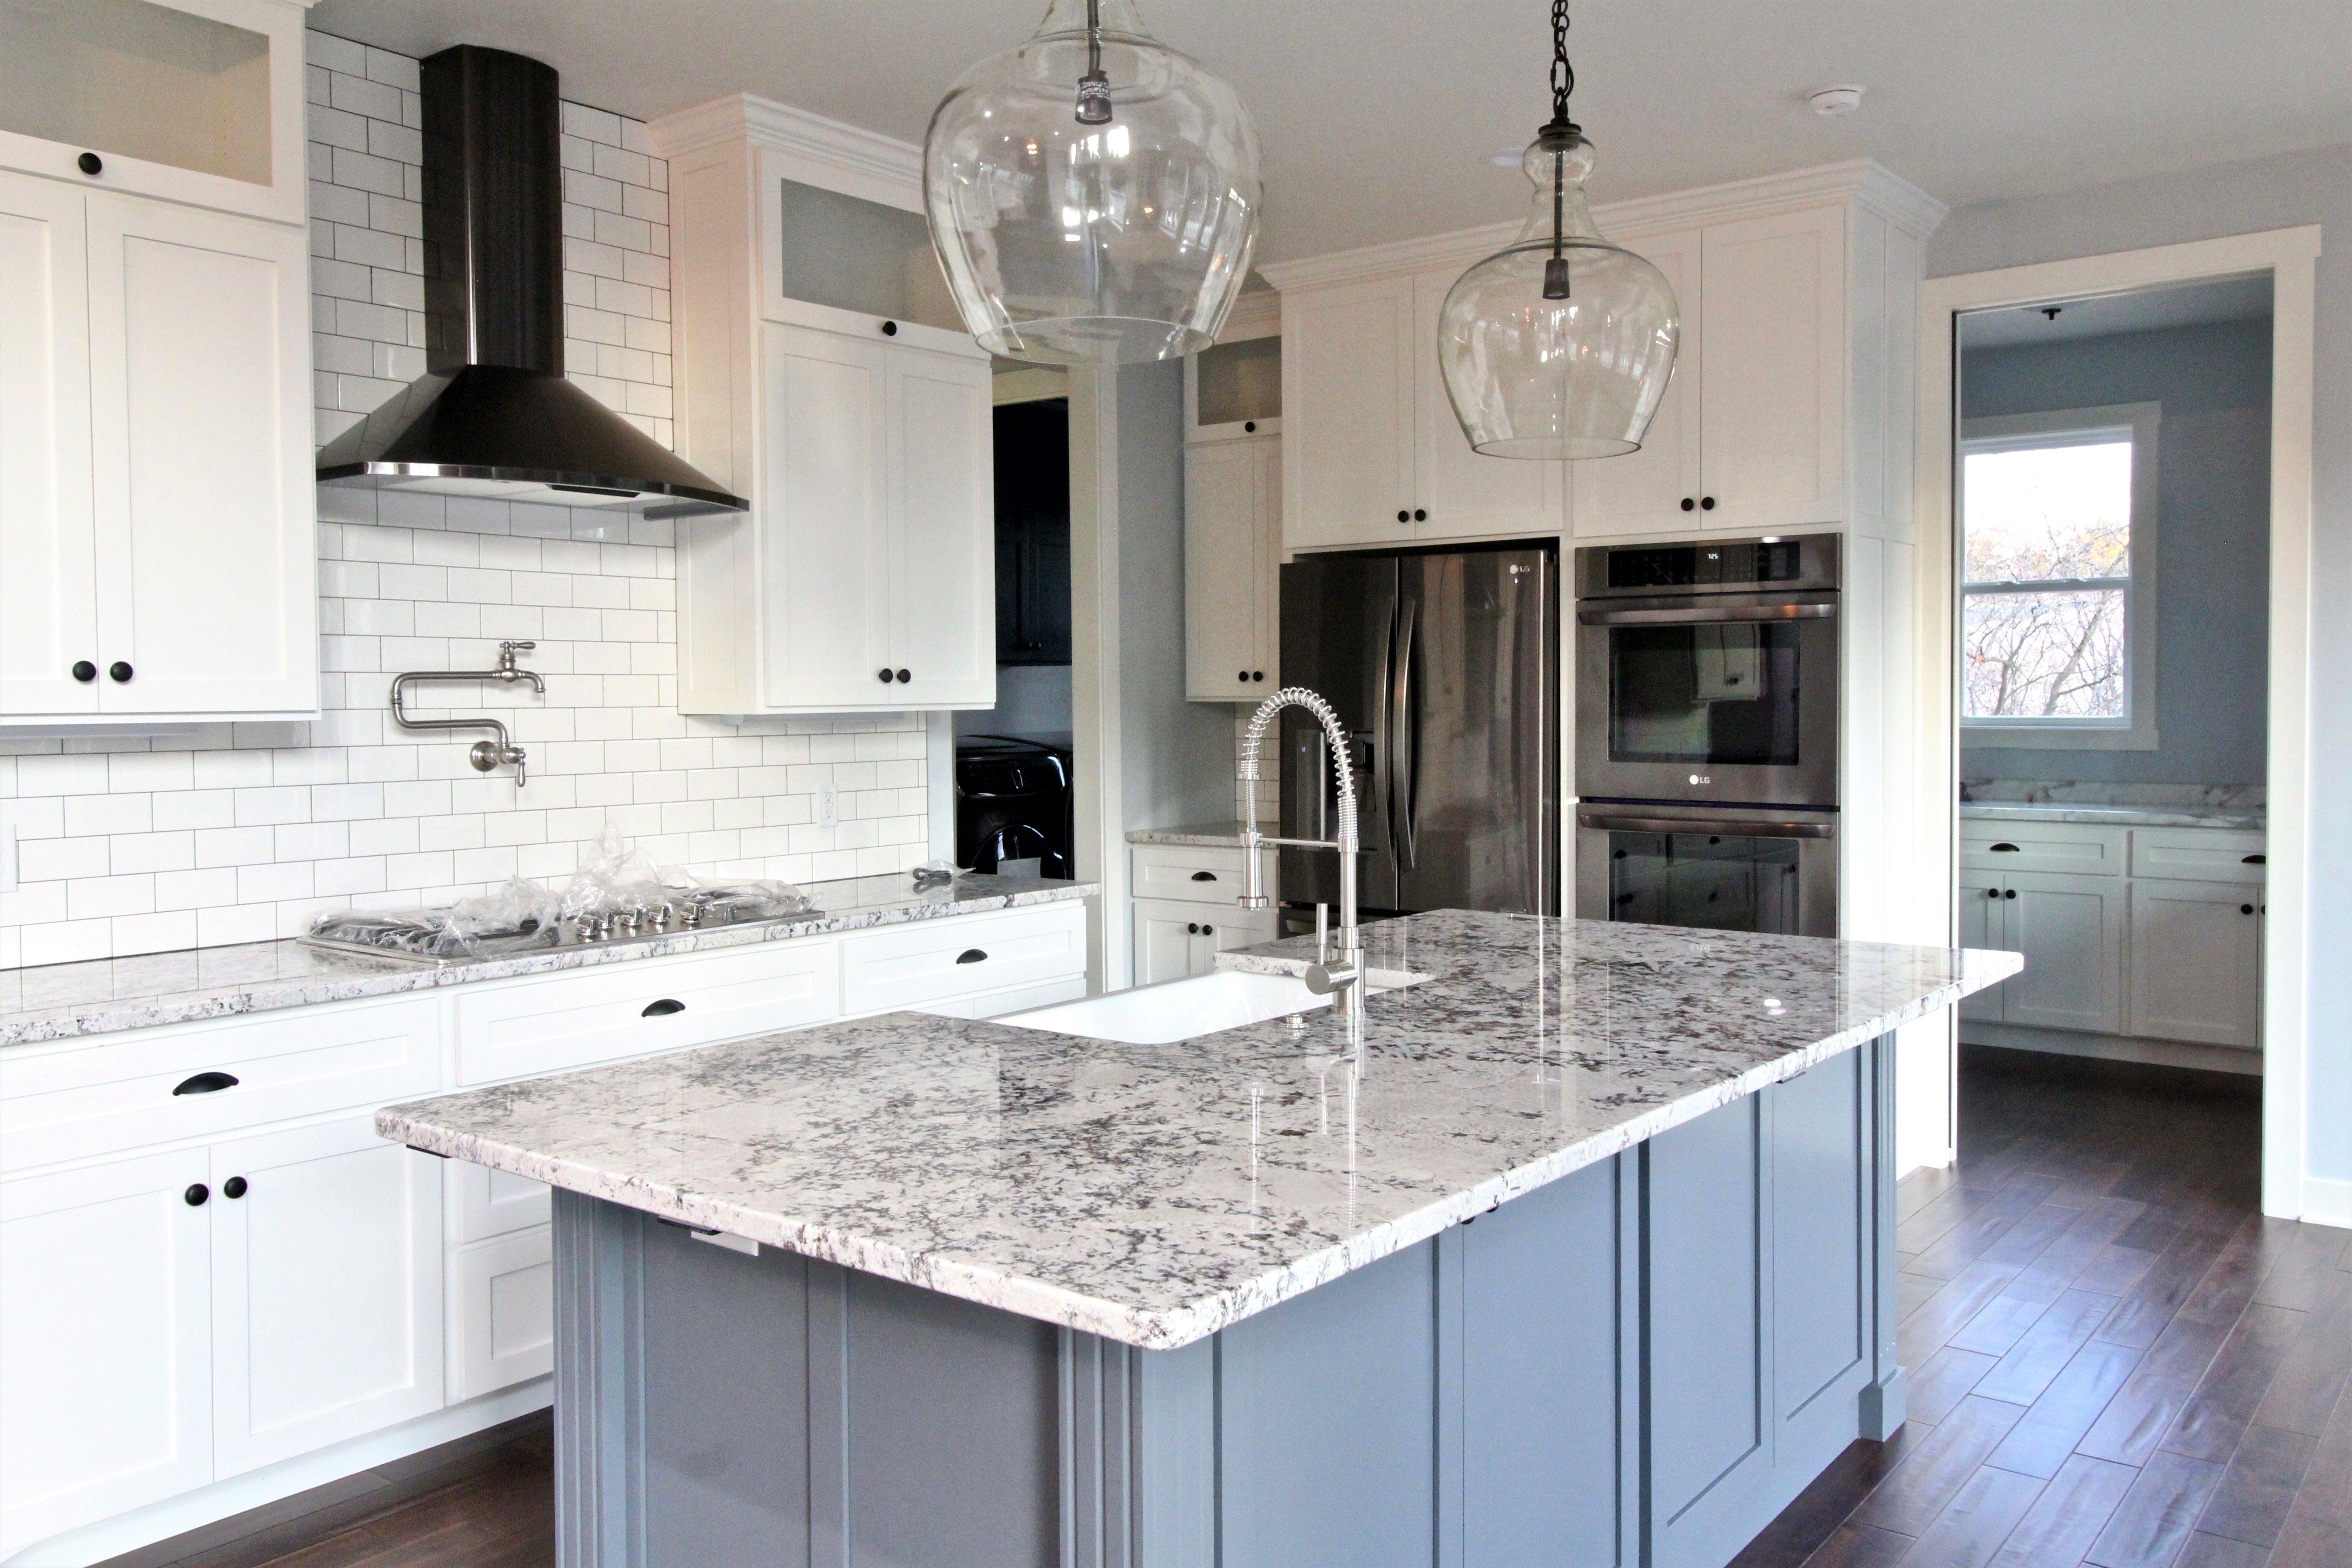 Kitchen, Grey island, white black stainless